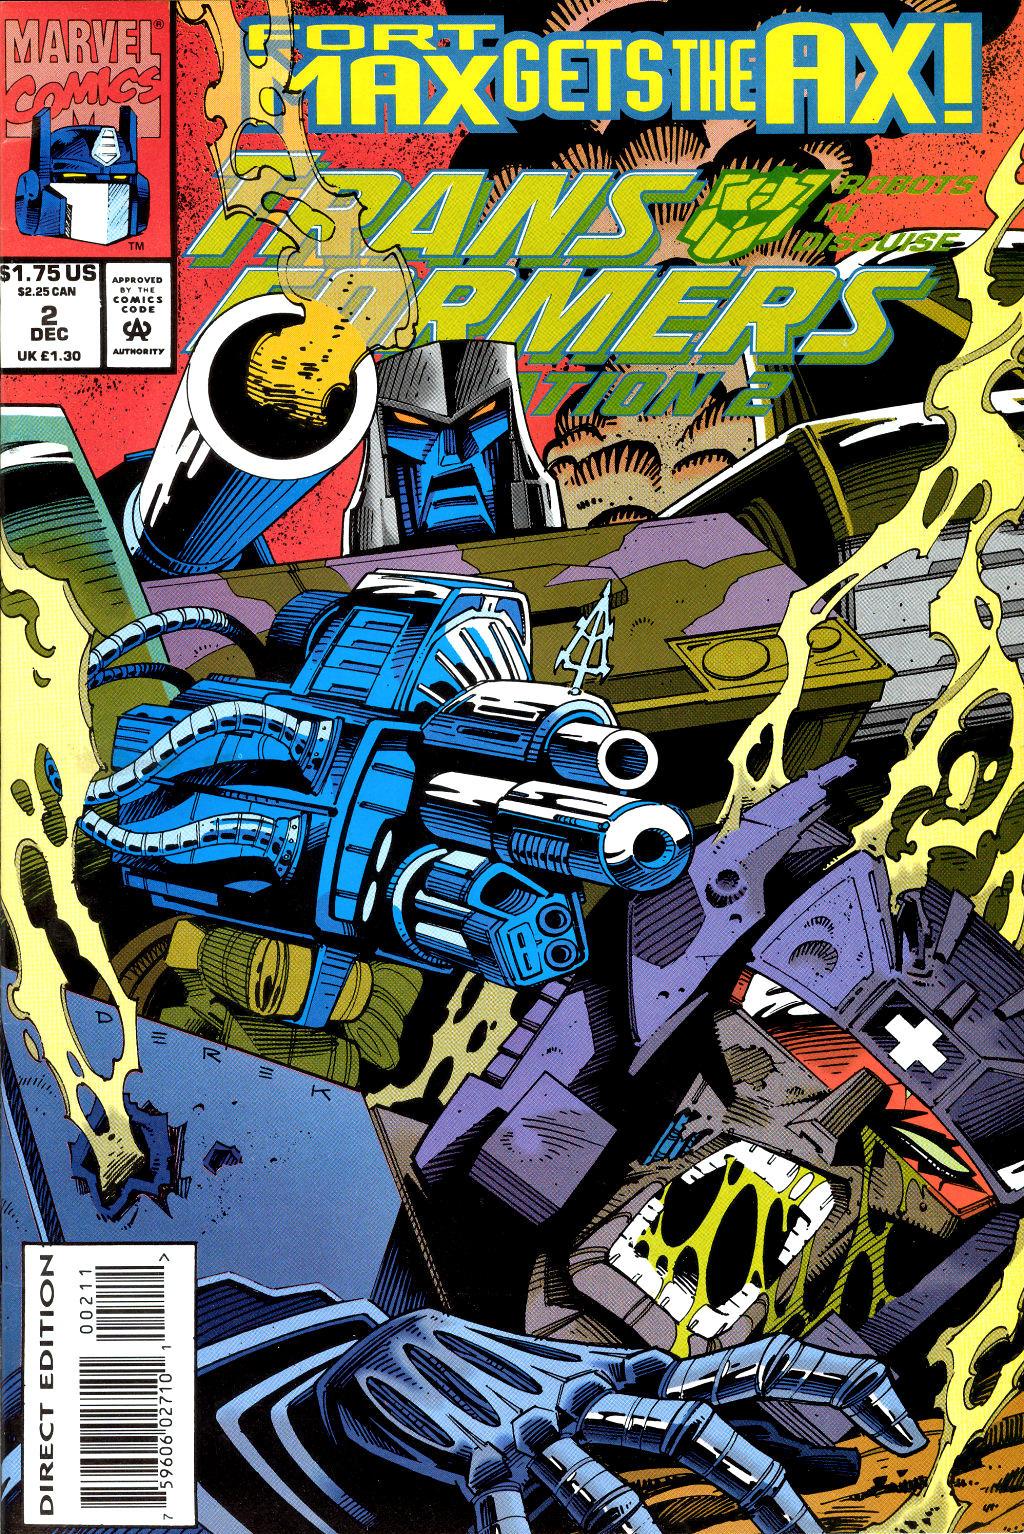 Leer The Transformers Generation 2 Online Español